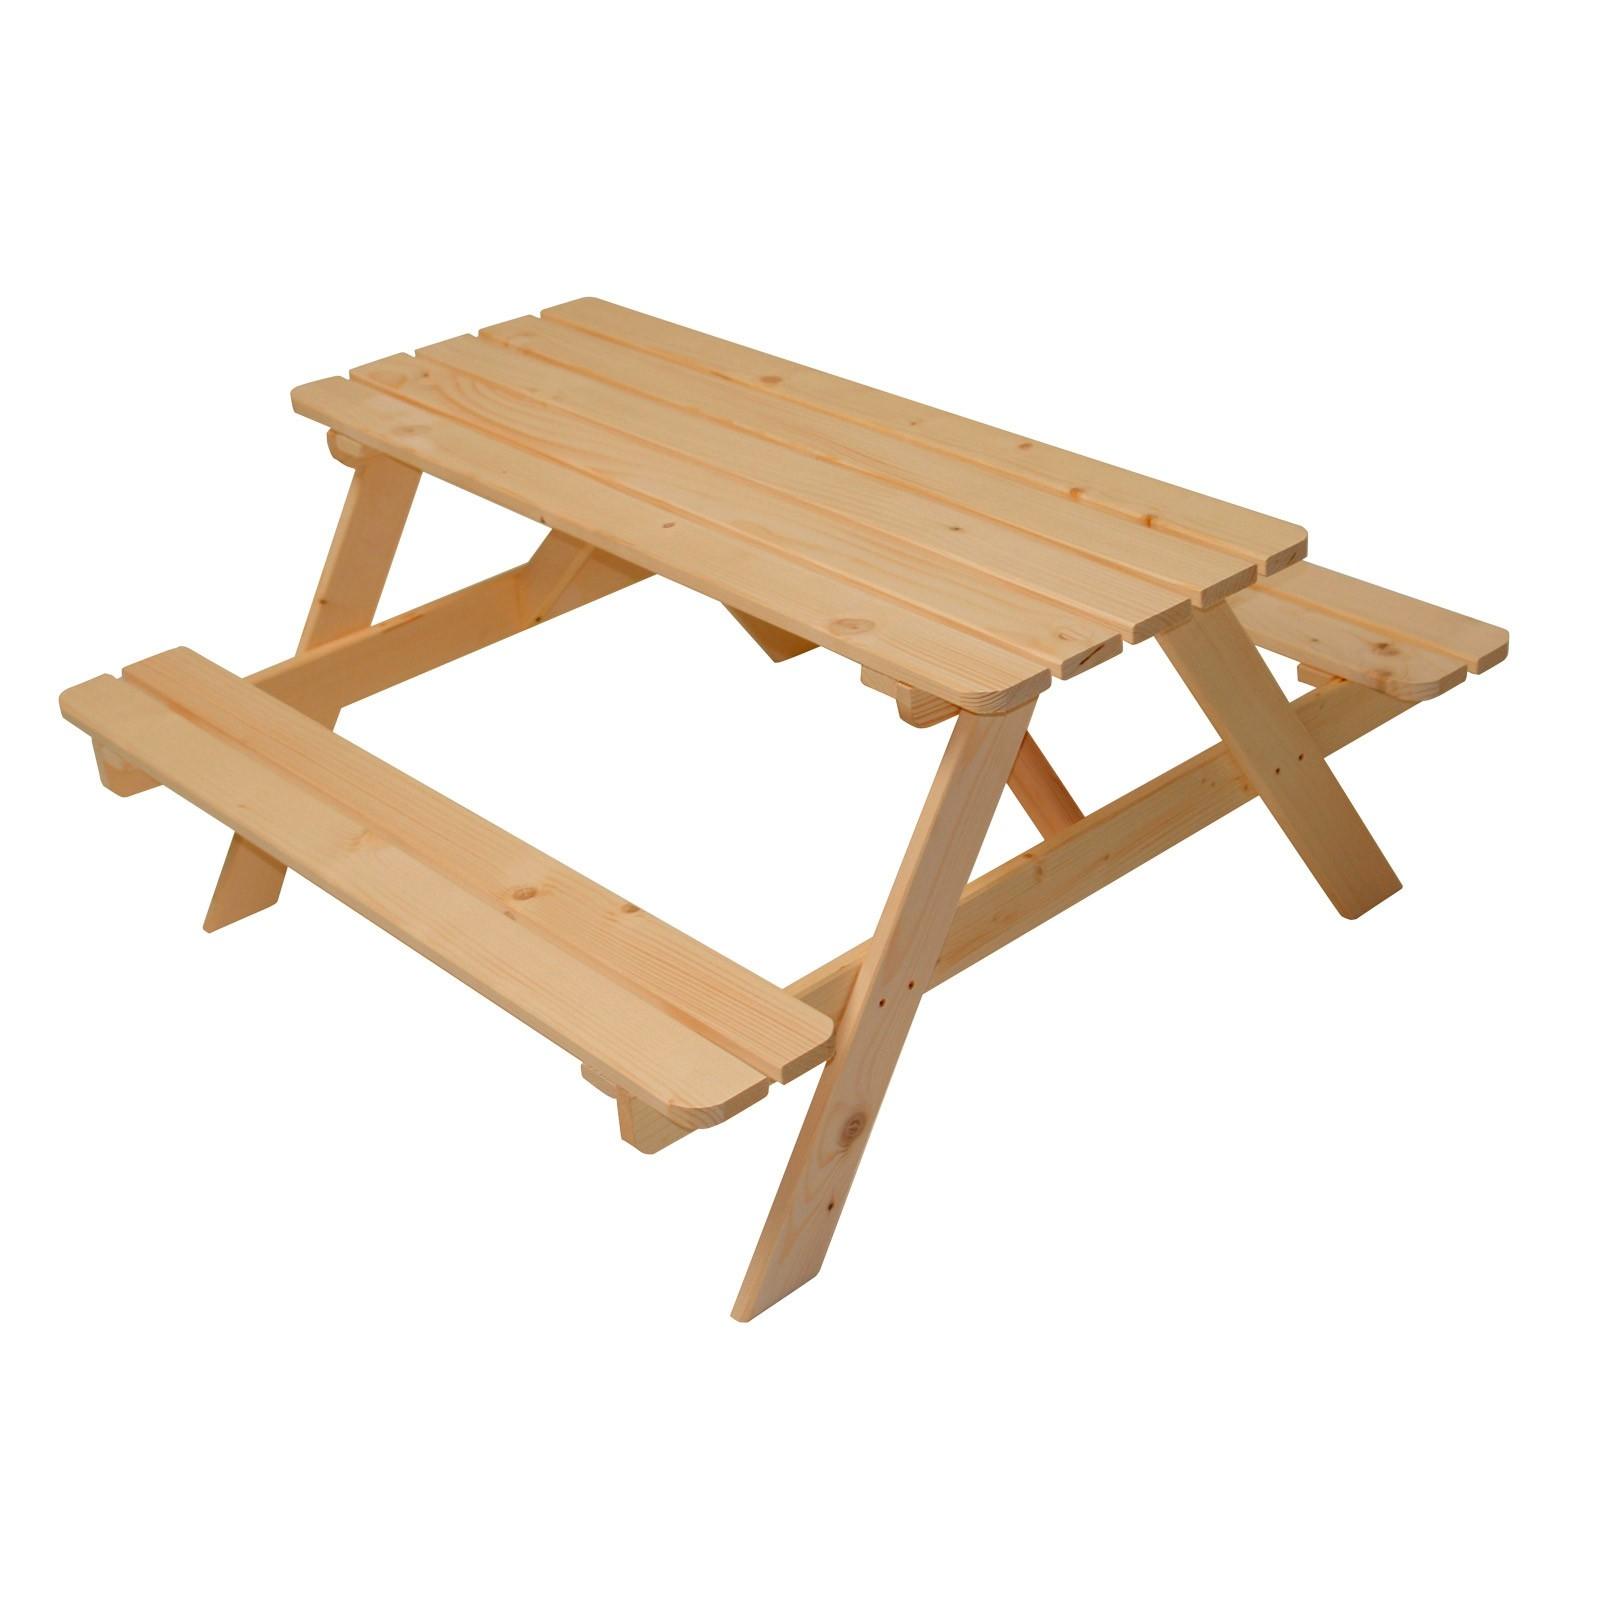 Kinder Sitzgruppe Picknick Tisch Bank Kombi Aus Fichtenholz